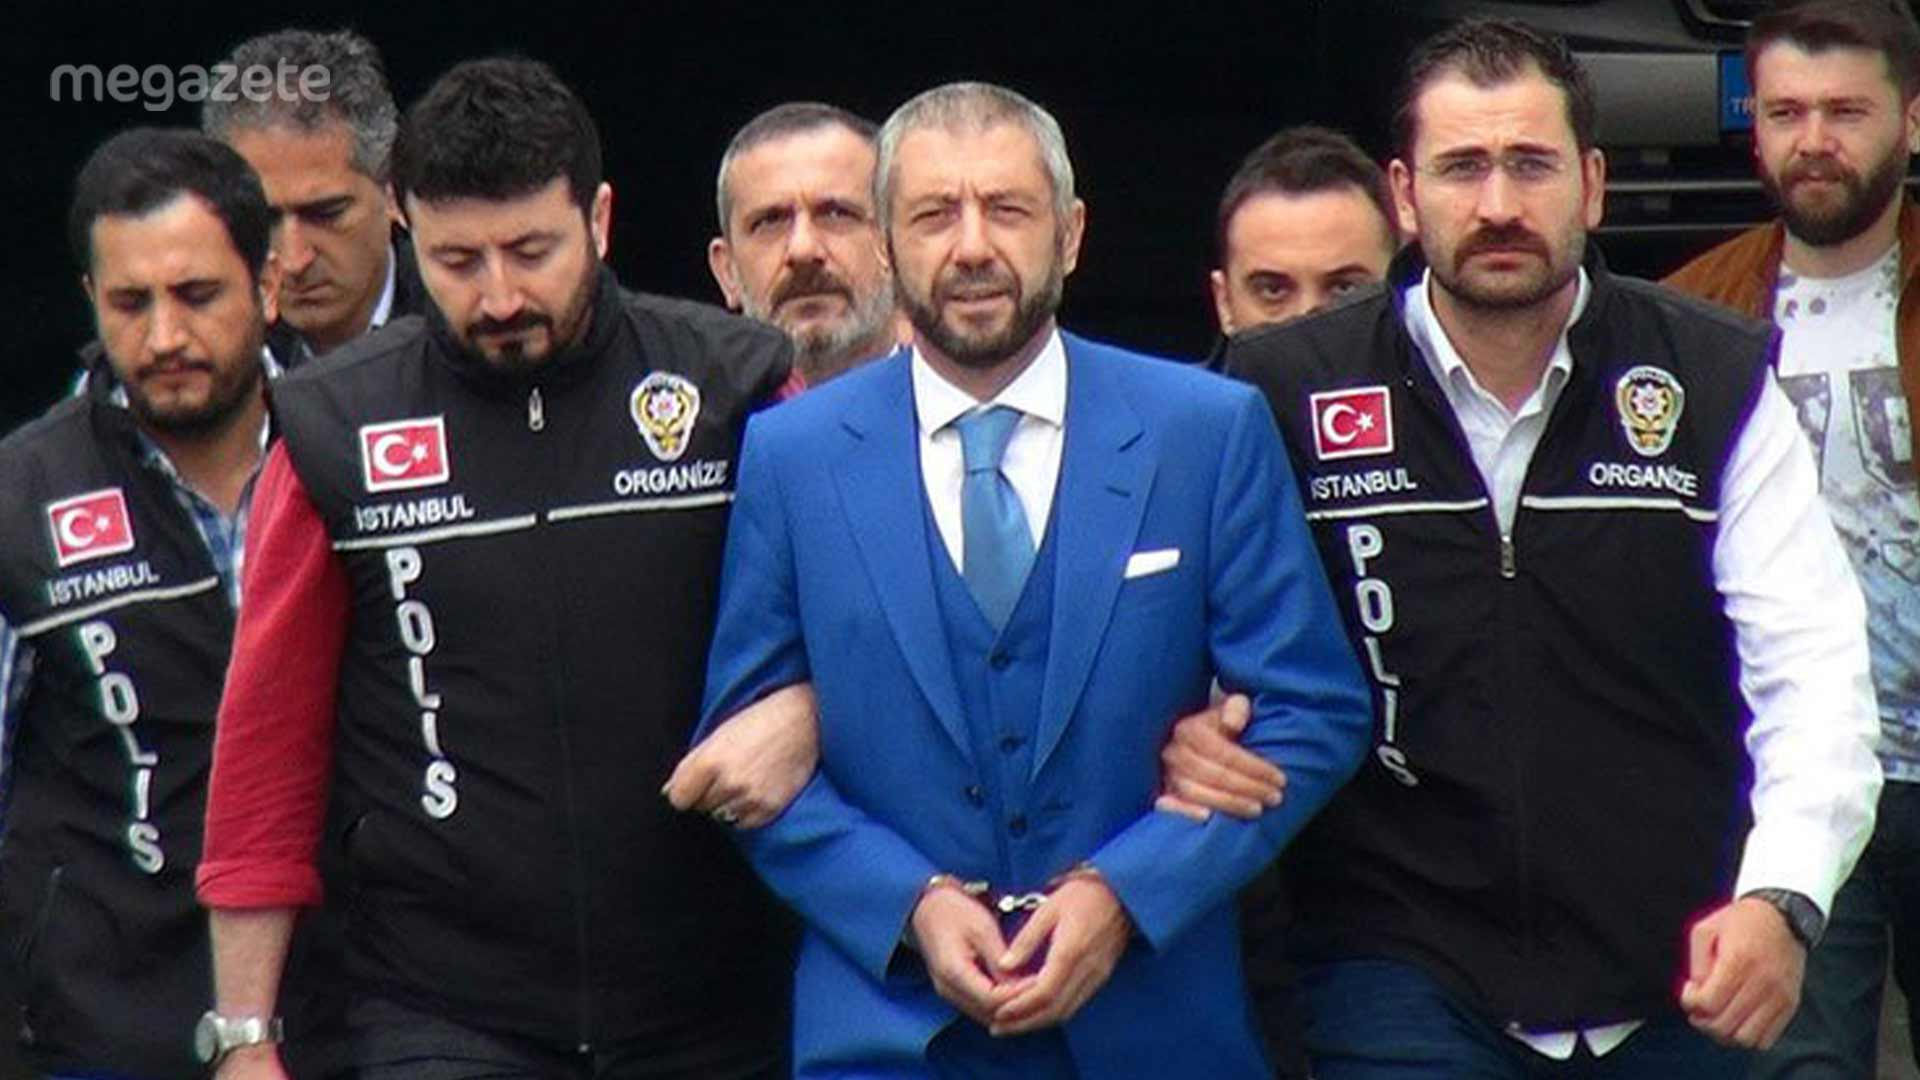 Türk Mafya Sedat Şahin